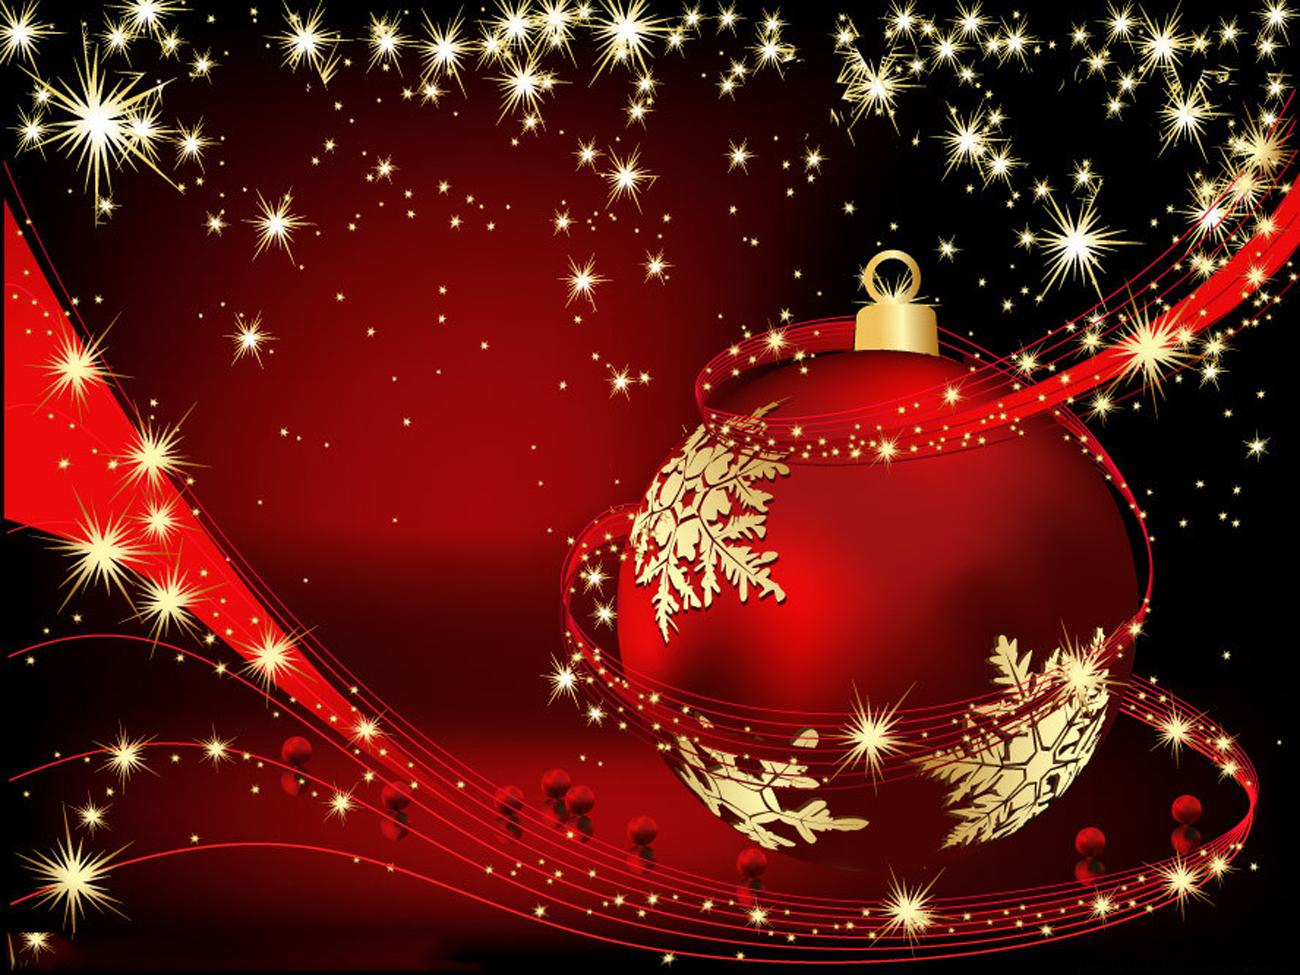 Christmas Holidays 10 Desktop Wallpaper - Hivewallpaper.com